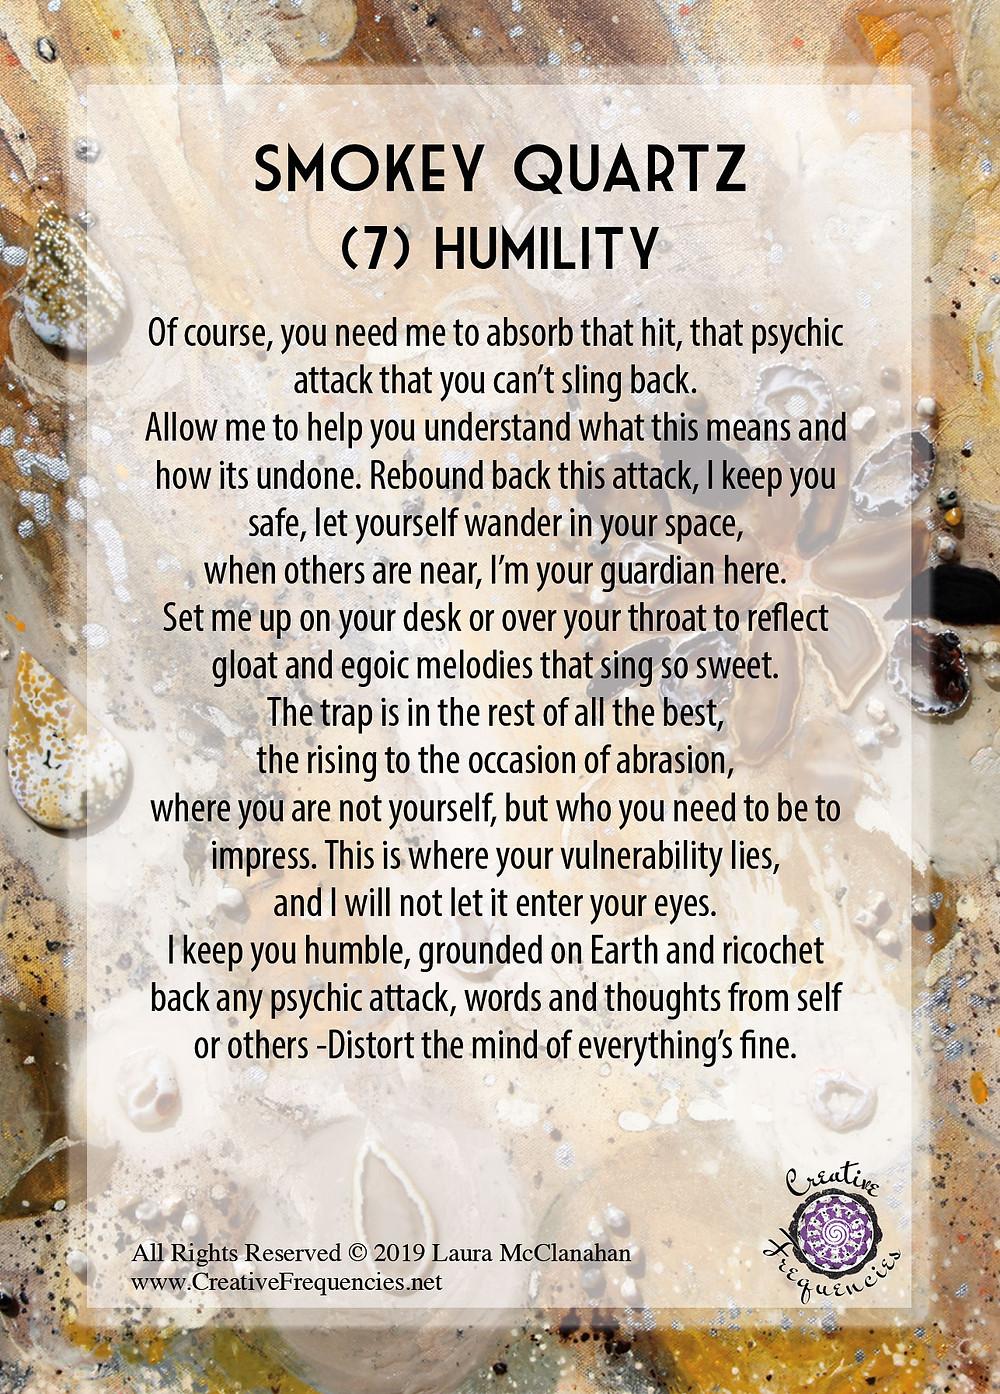 Smokey Quartz (7) Humility